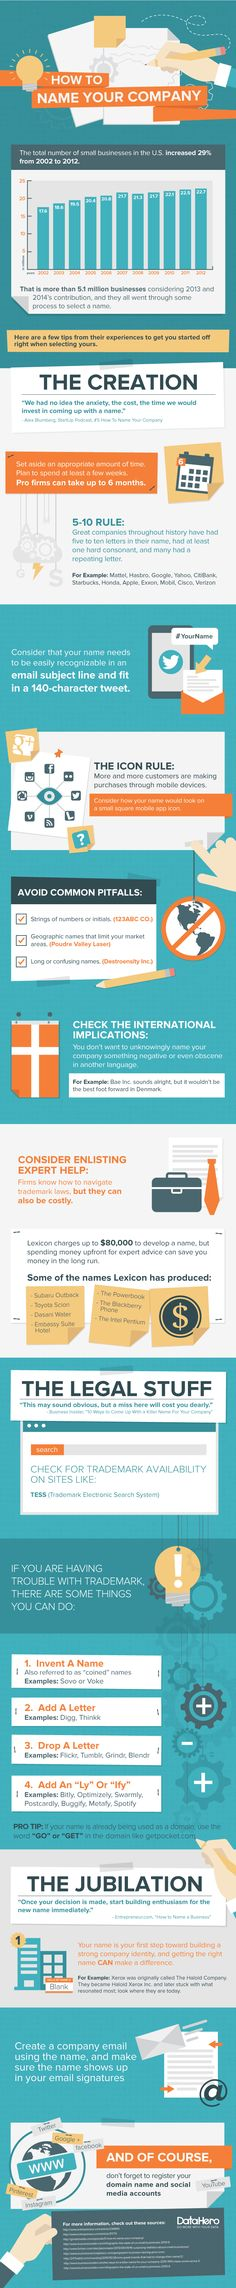 How to Name Your Company (Infographic) | Inc.com